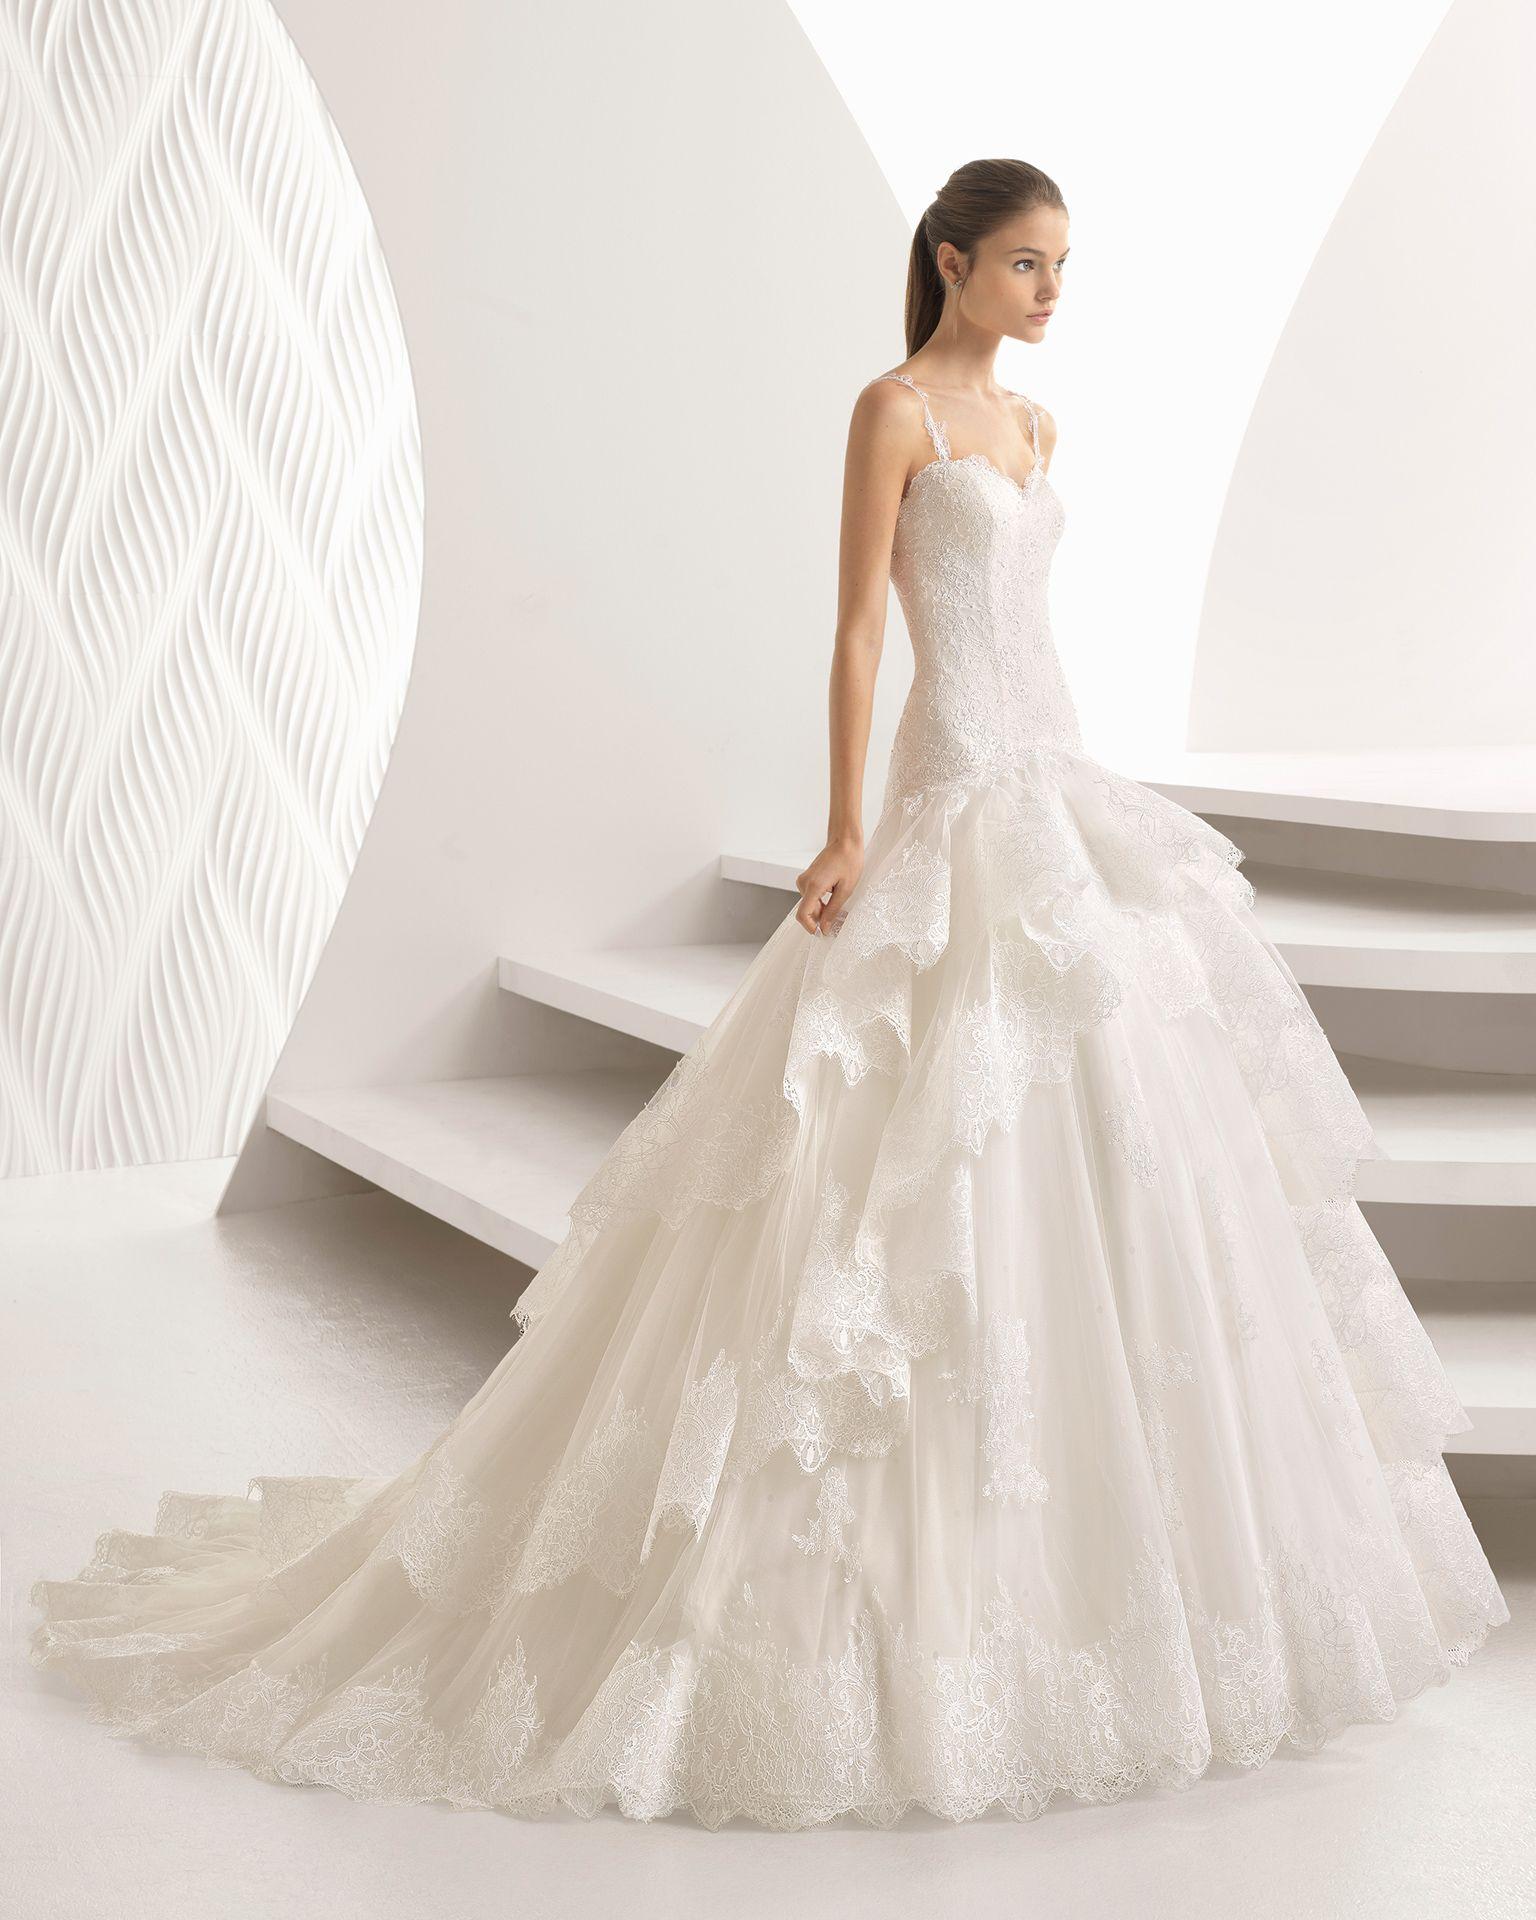 ALTUR - 2018 Bridal Collection. Rosa Clará Collection